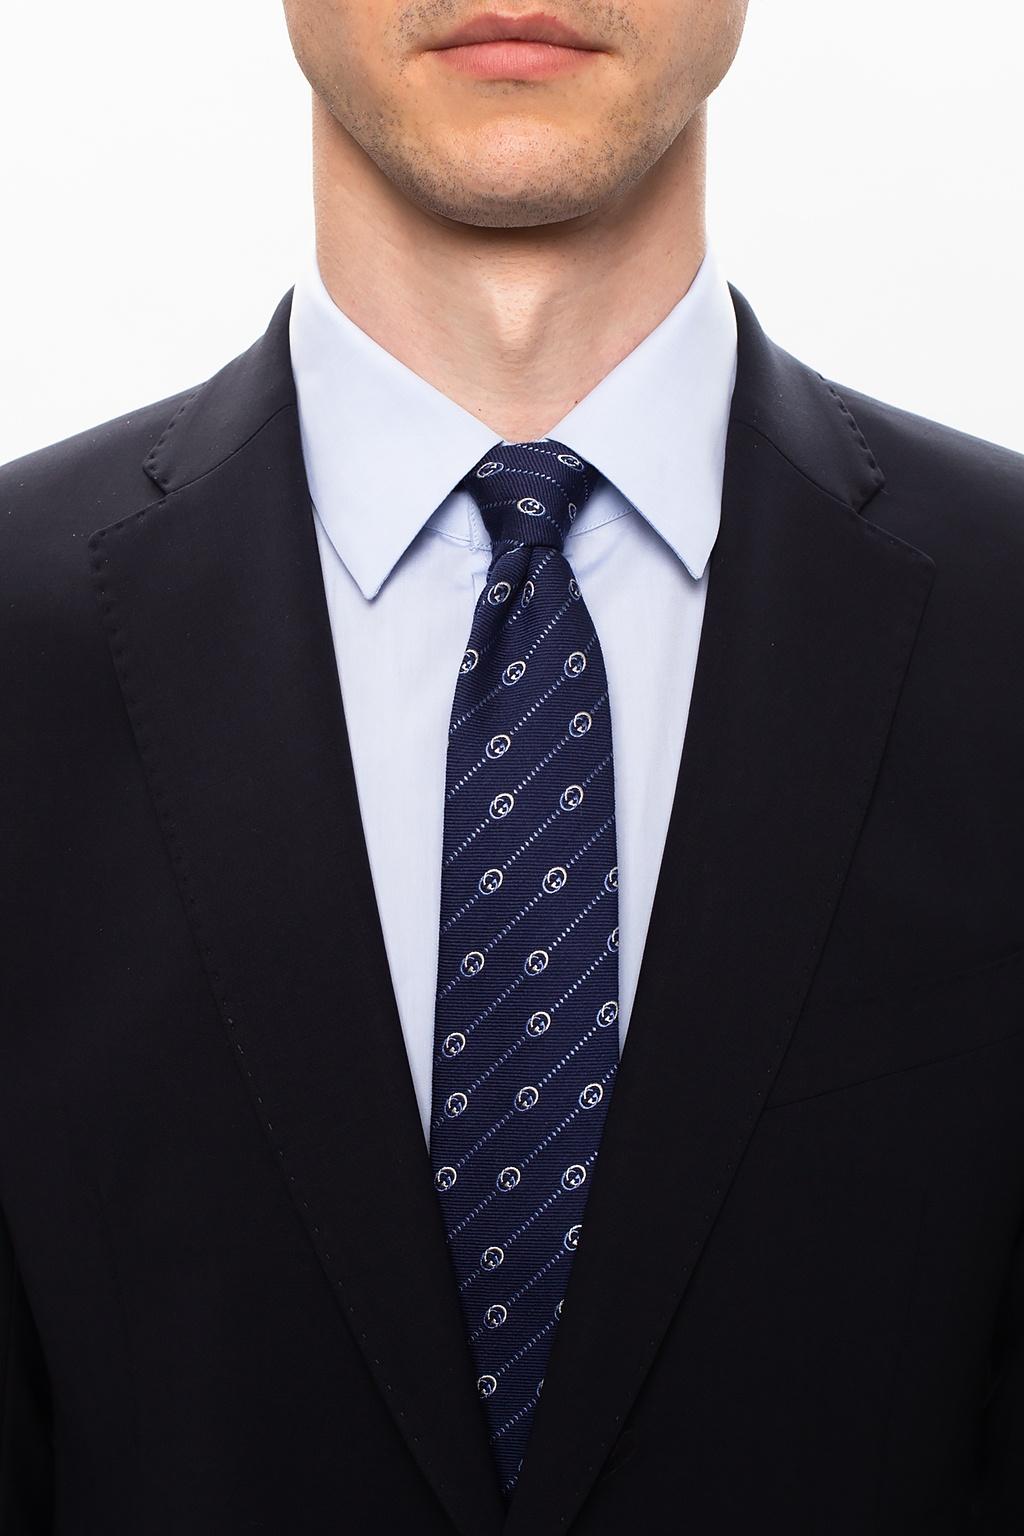 Gucci GG motif tie